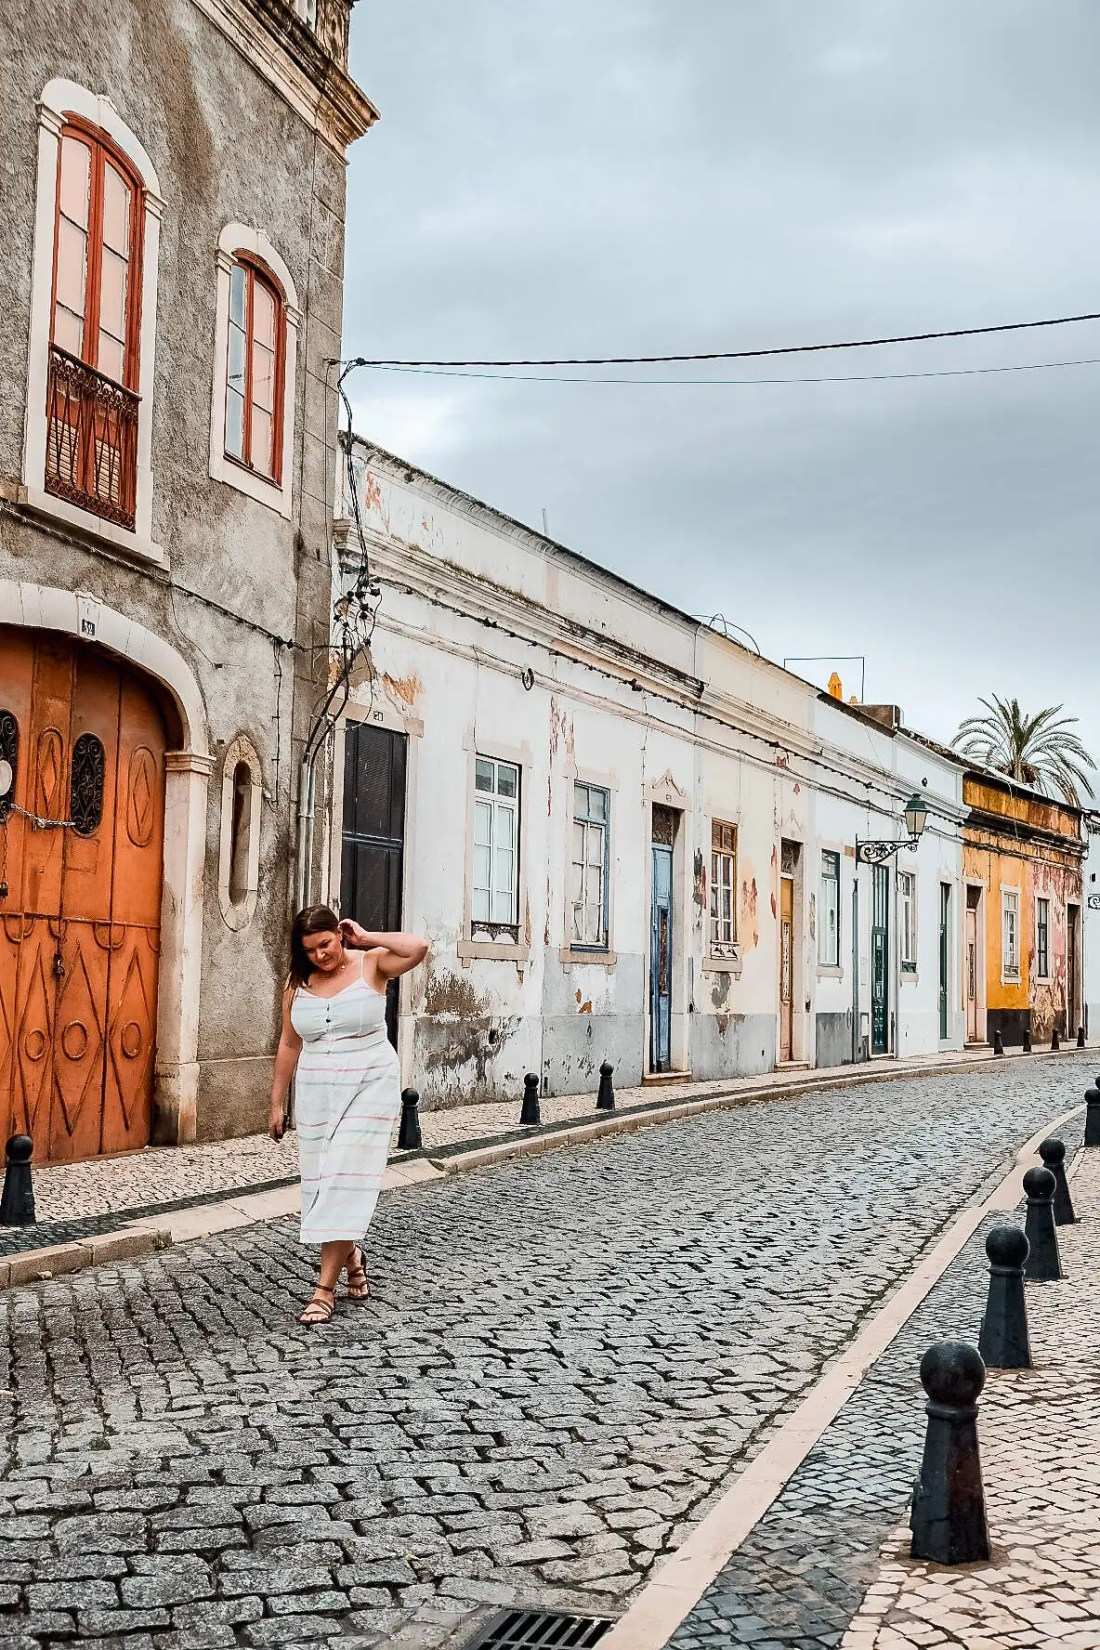 Faro travel tips